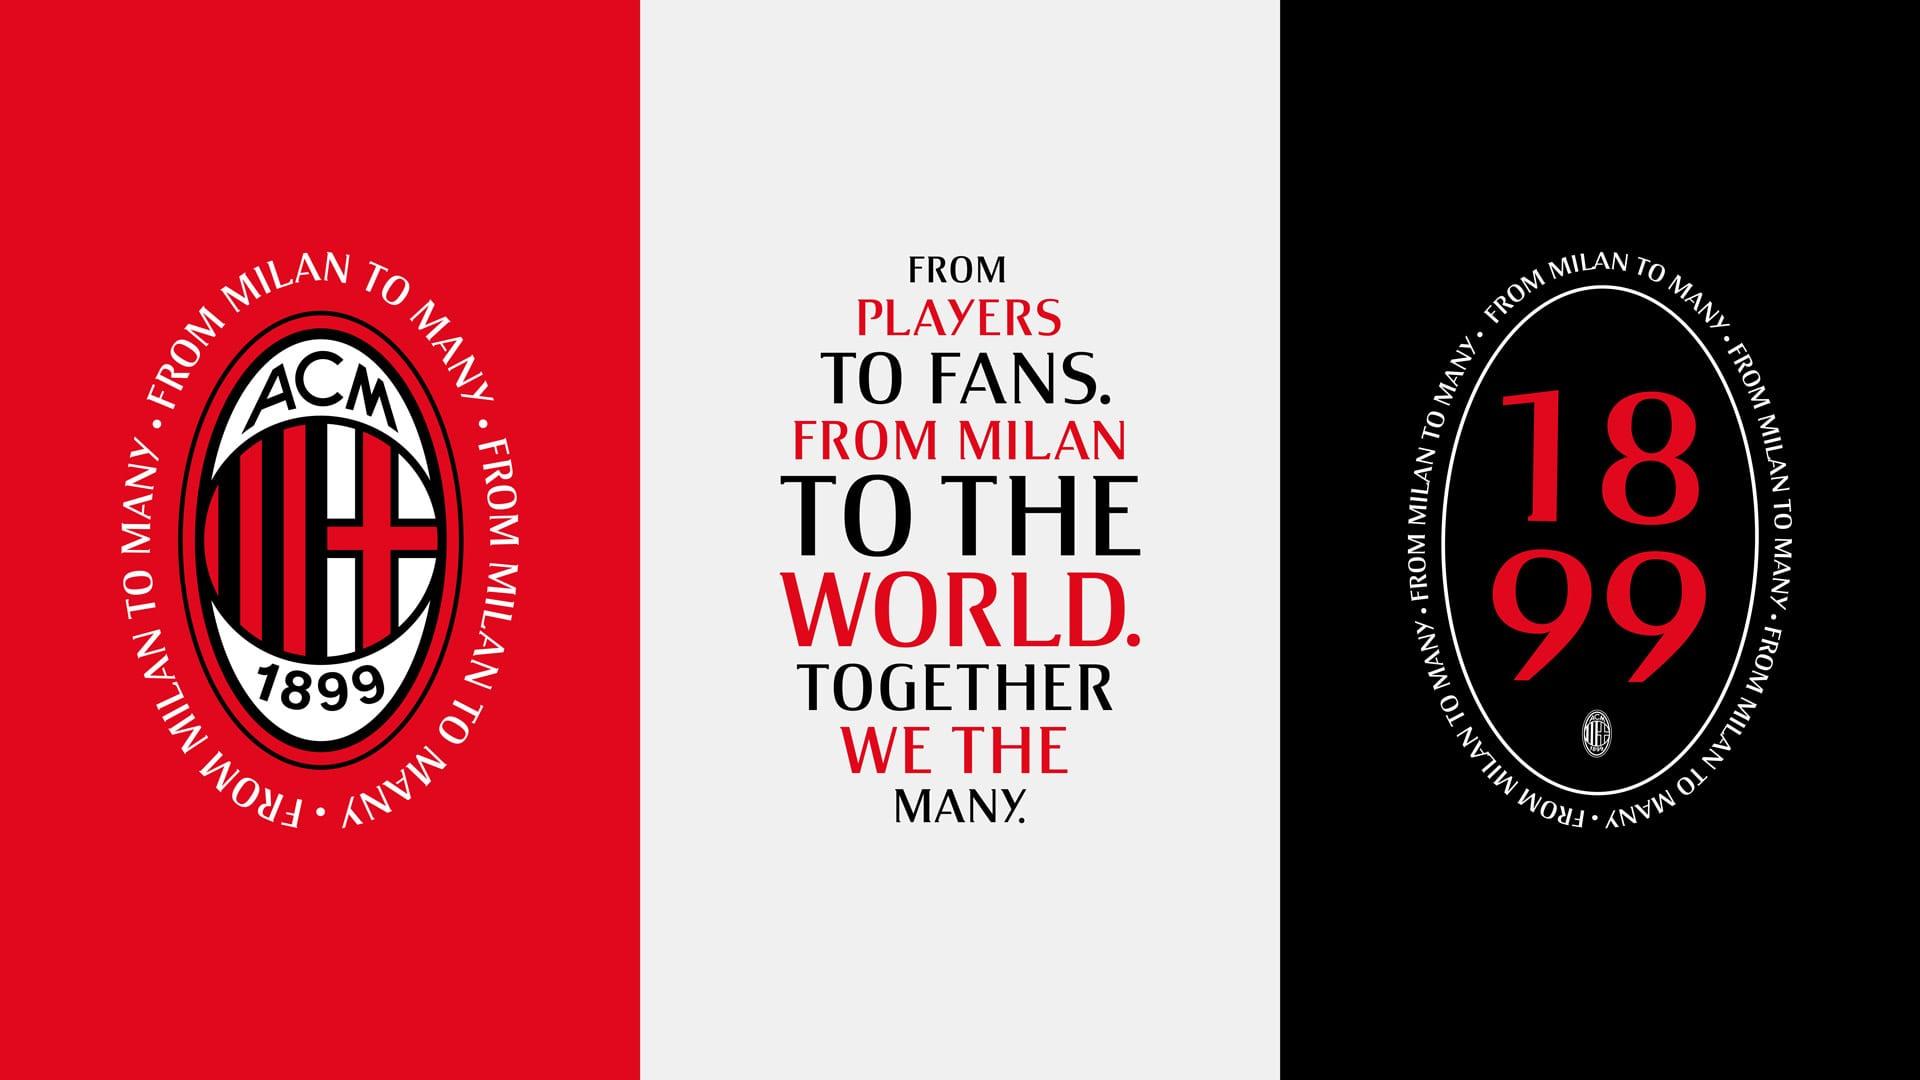 ac milan s novym logom aj custom fontom acbody2 1 - AC Milan s novým logom aj custom fontom